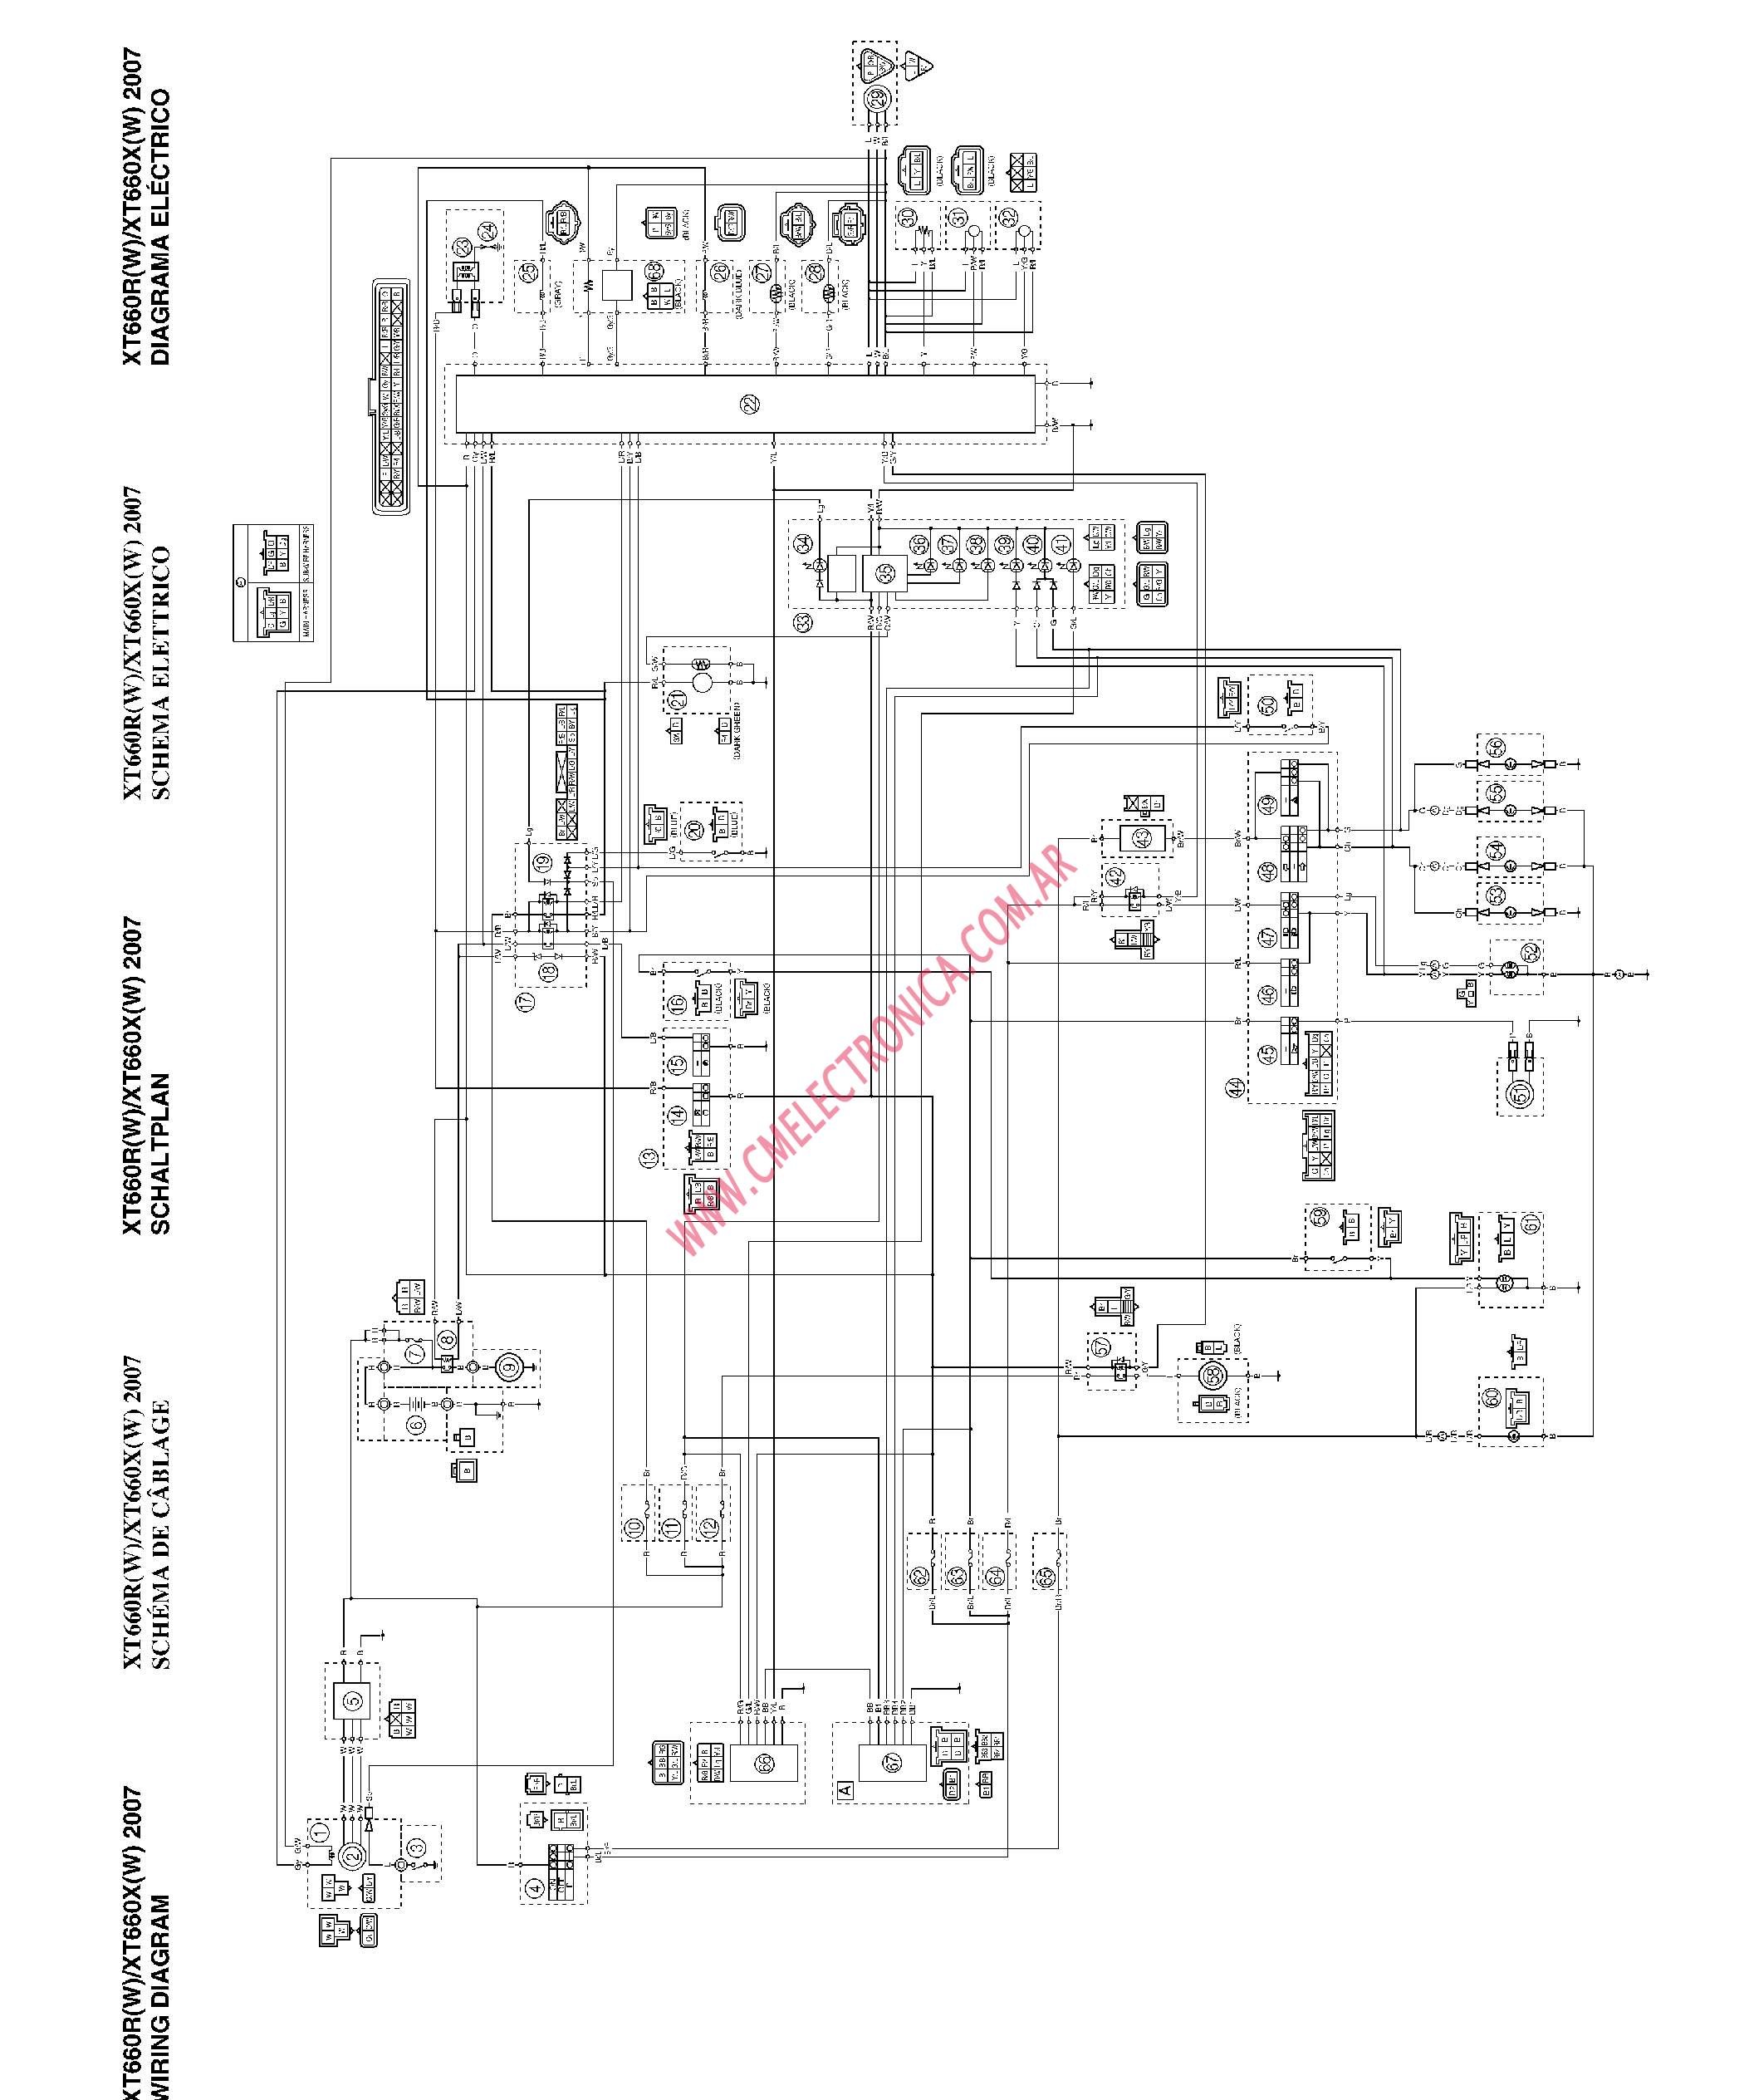 Vbb Wiring Diagram Electrical Diagrams Vespa Px 125 Schematics Snatch Block